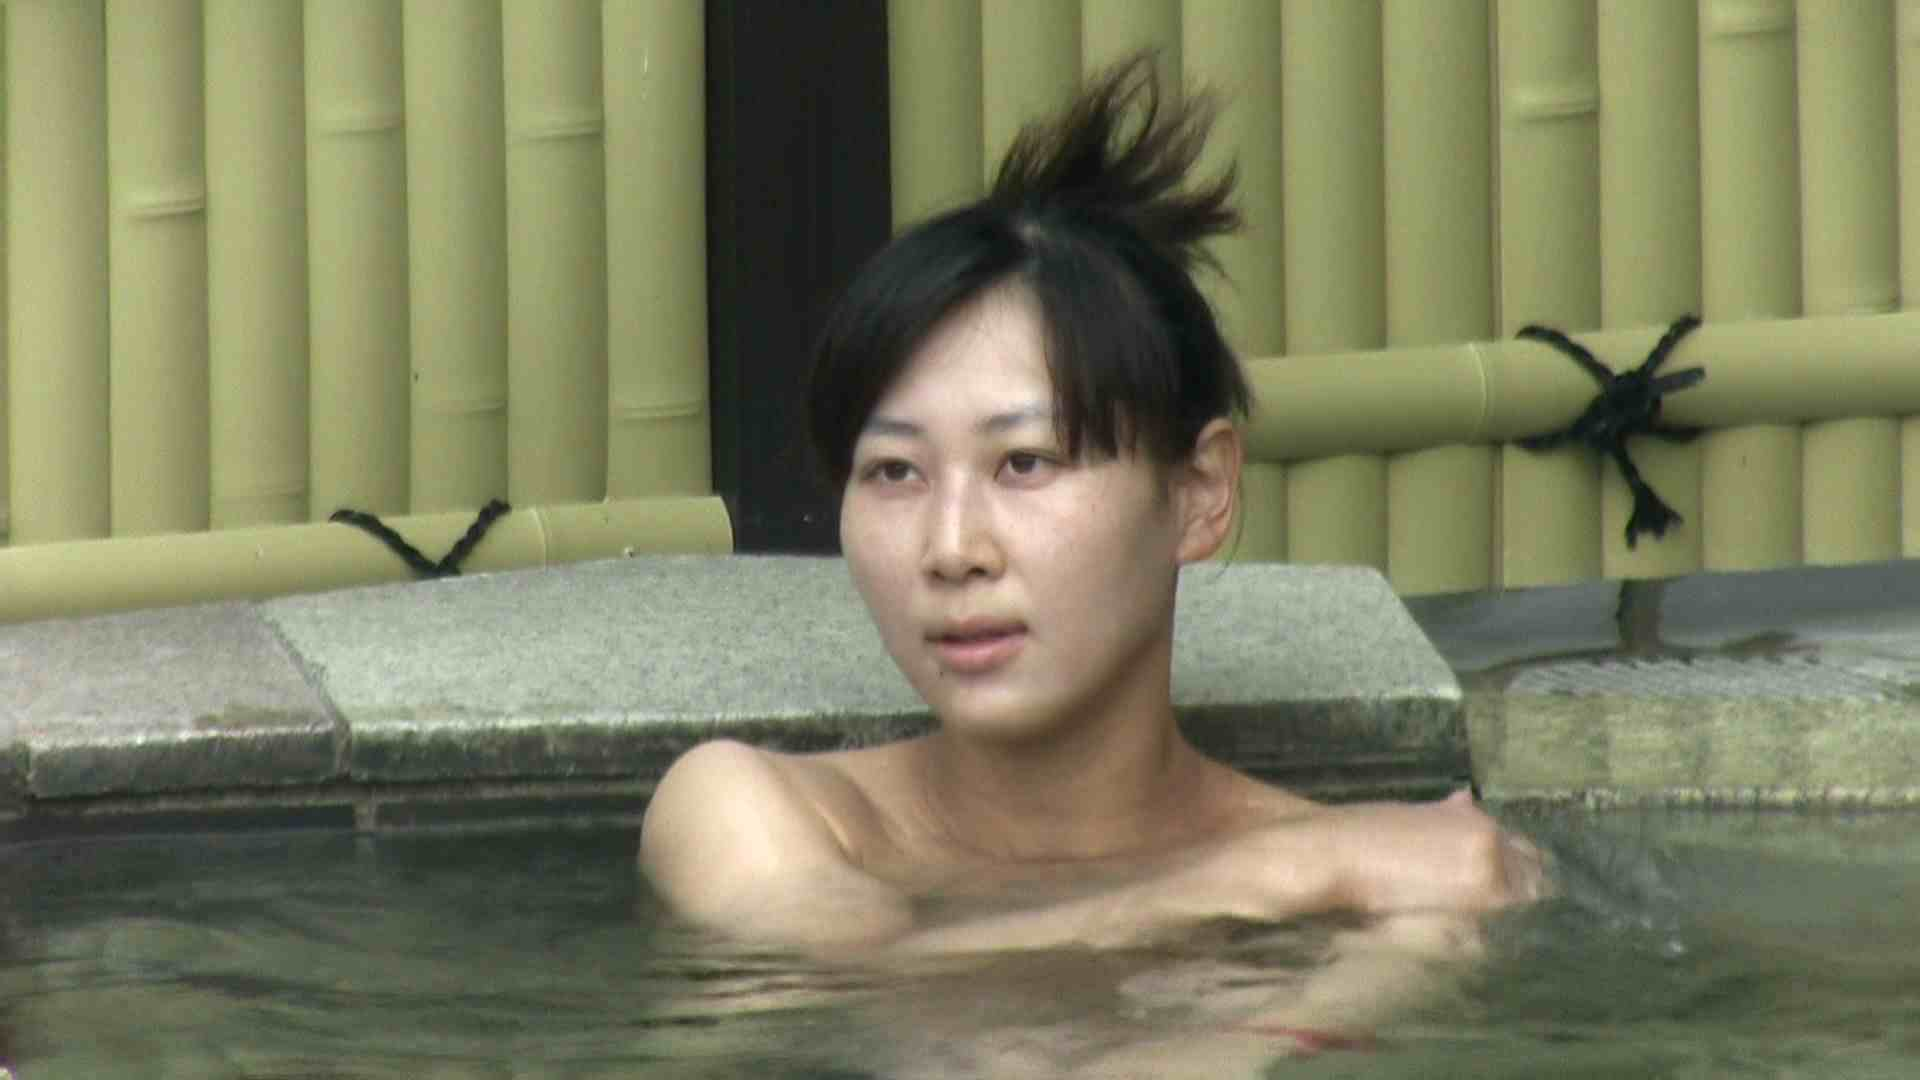 Aquaな露天風呂Vol.665 HなOL   盗撮  104pic 56